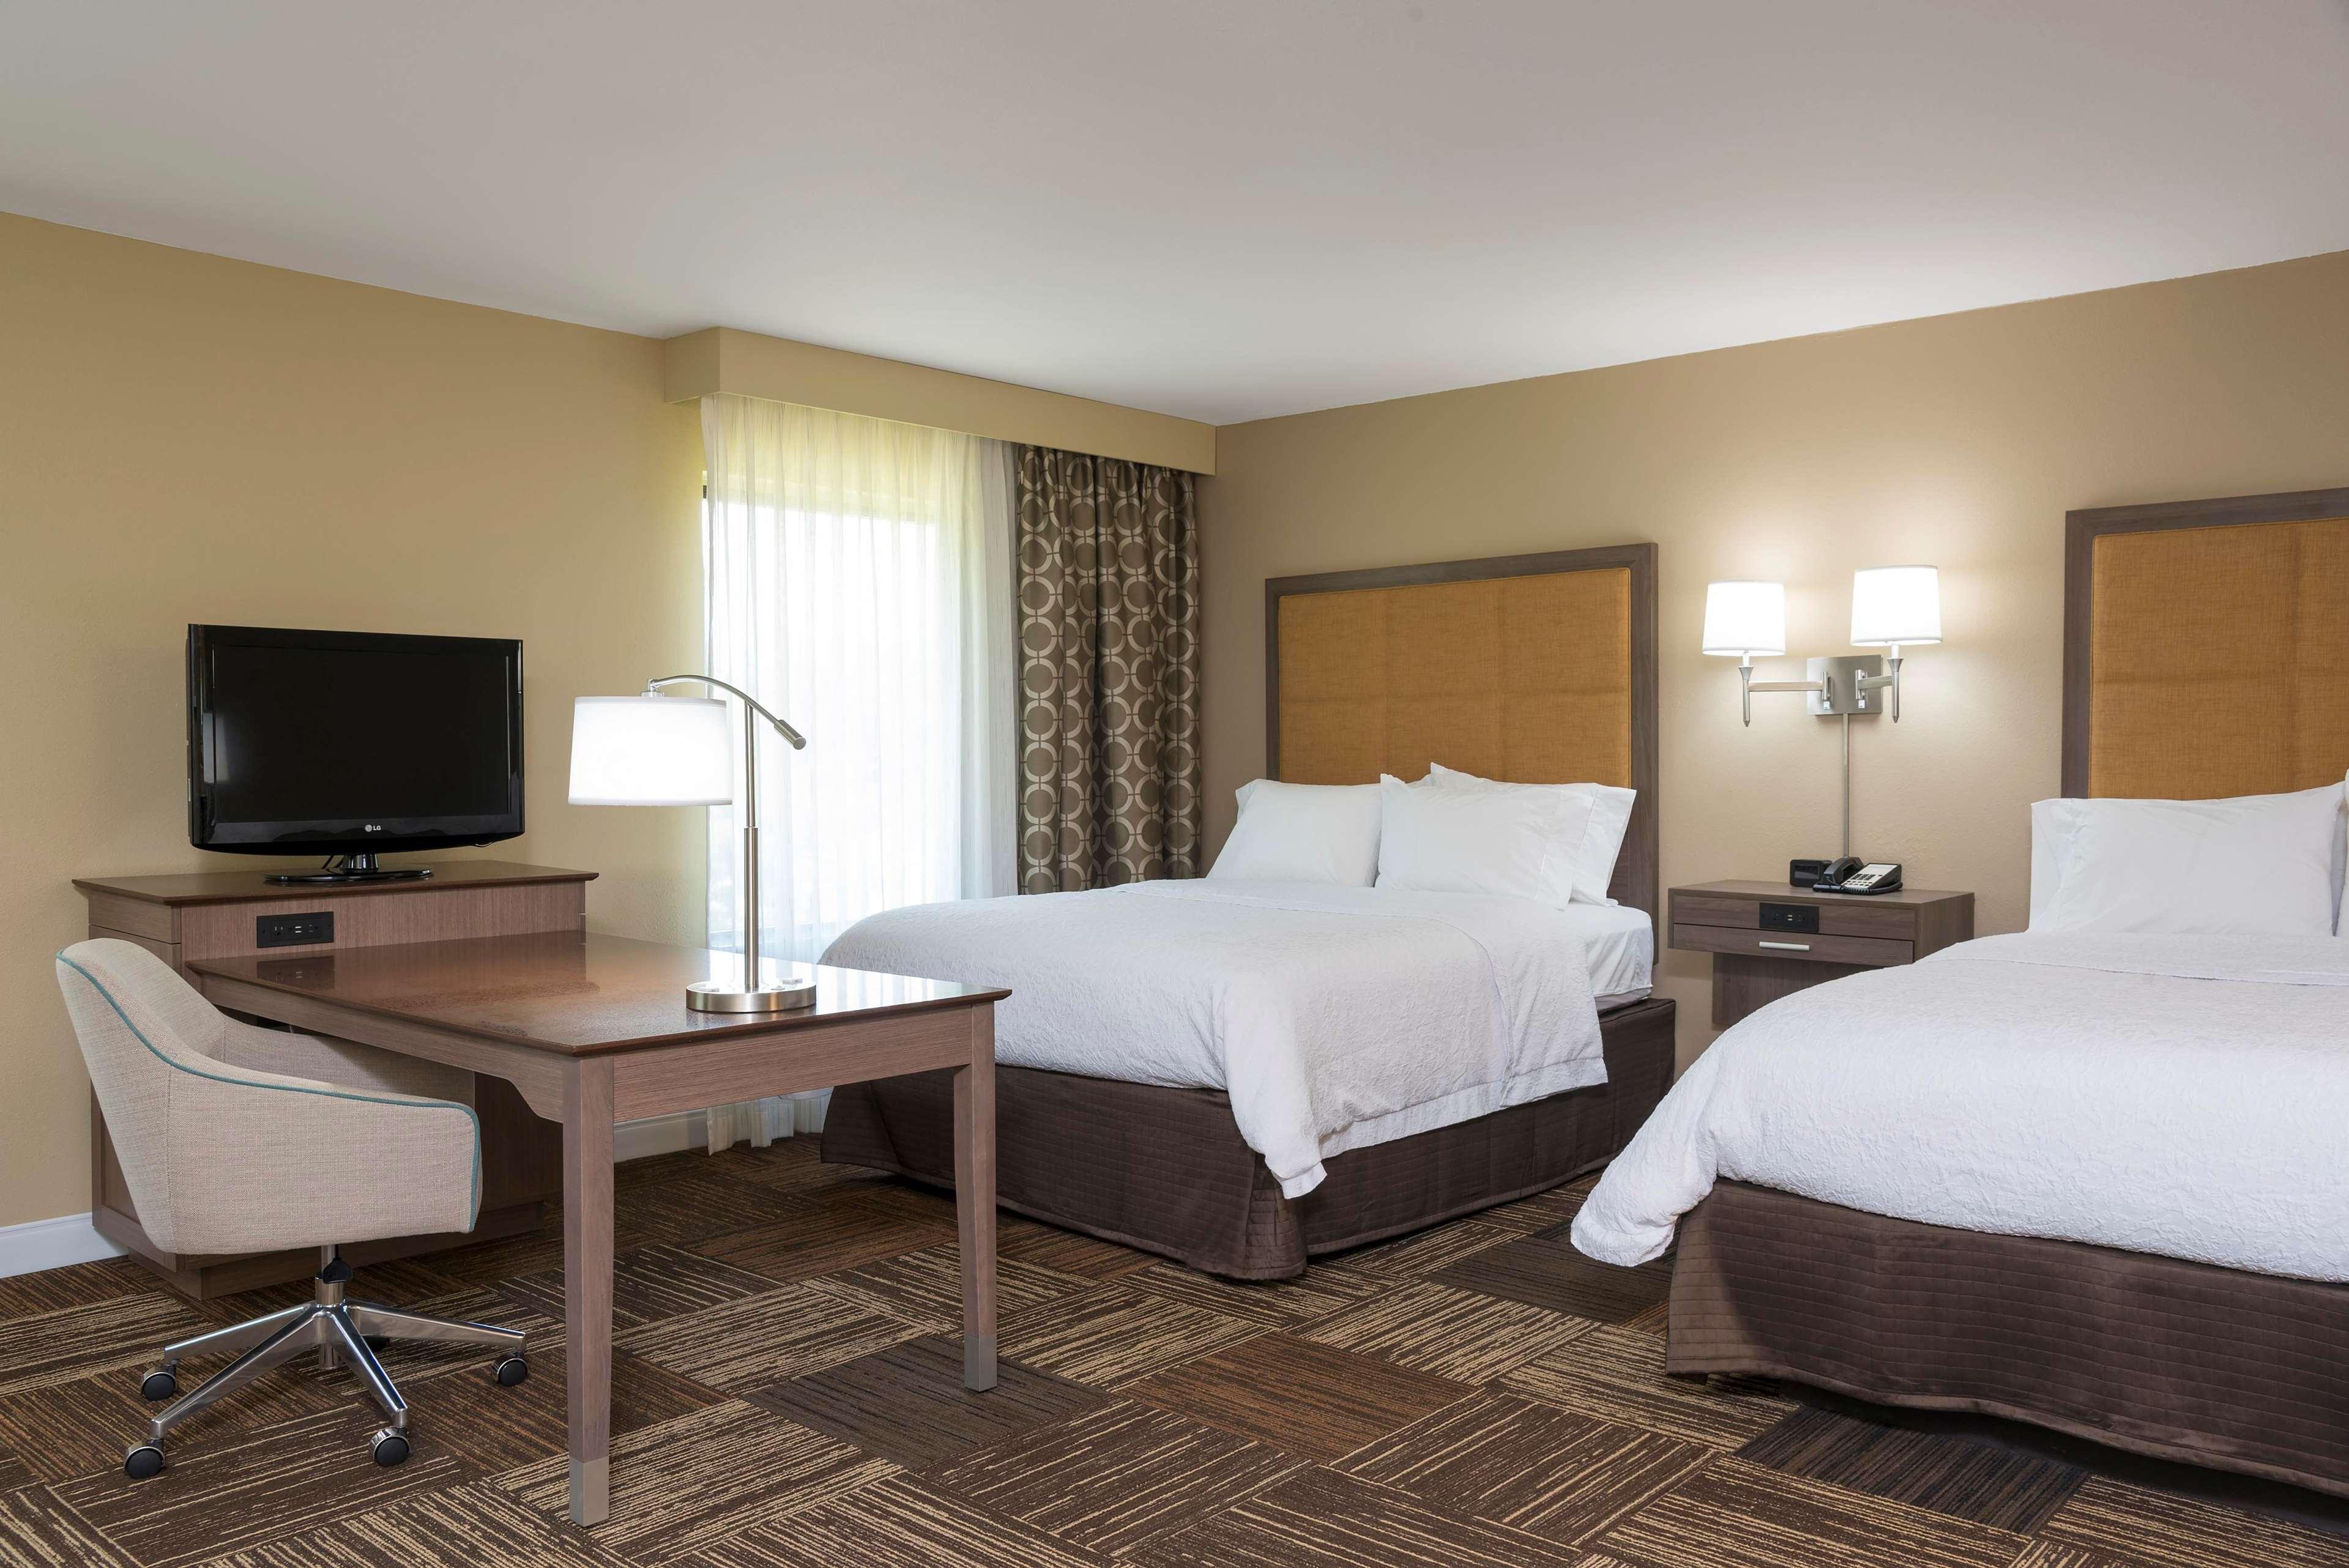 Hampton Inn & Suites Mansfield-South @ I-71 image 14